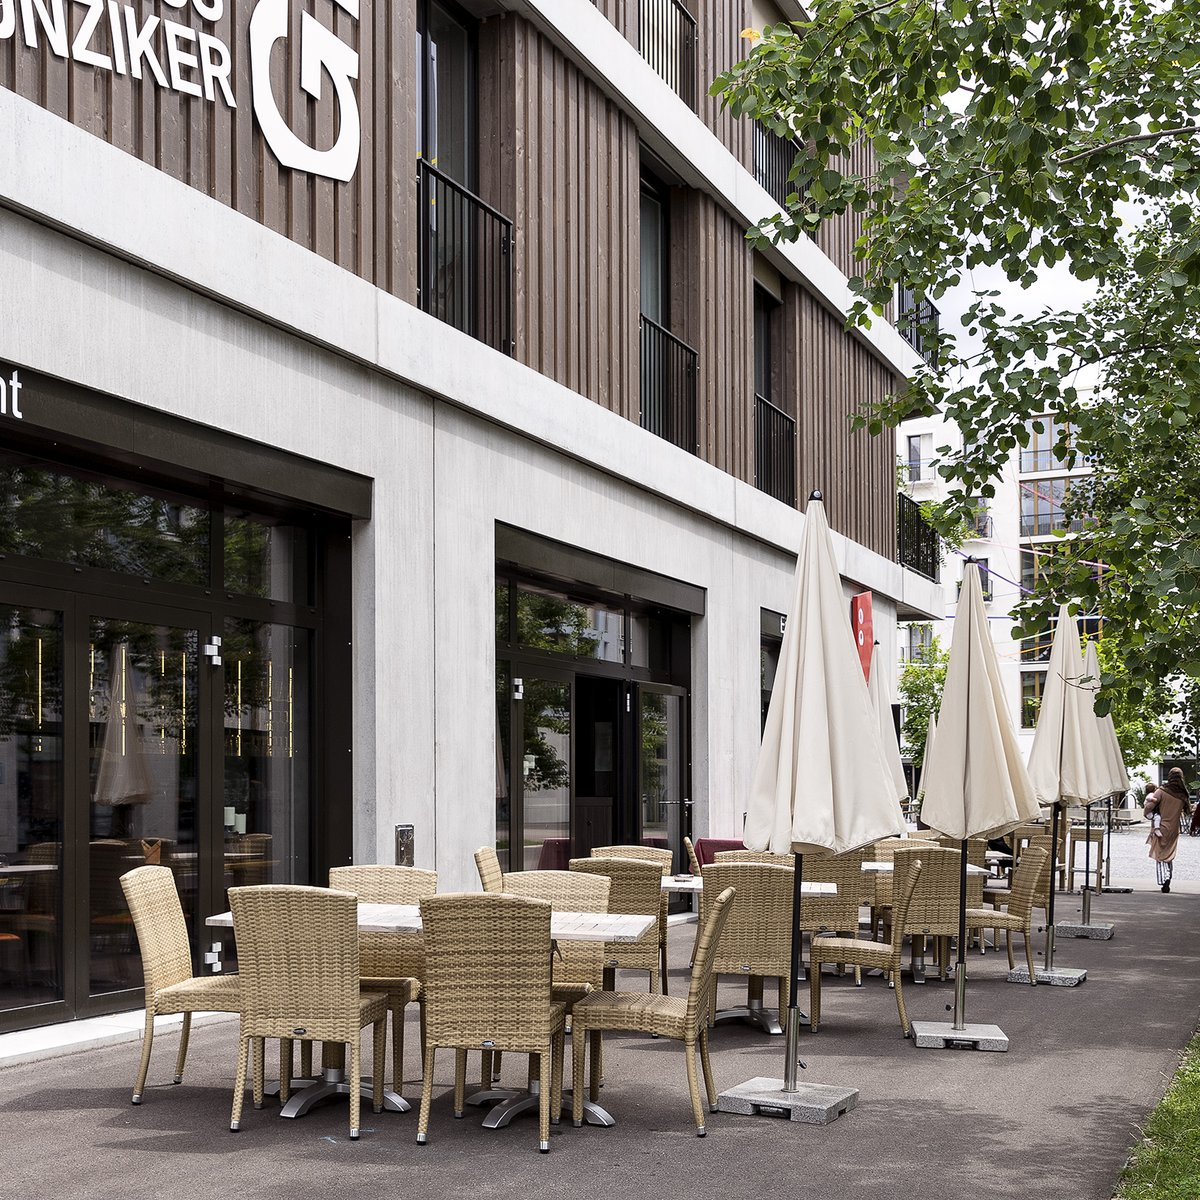 Restaurant Riedbach 1